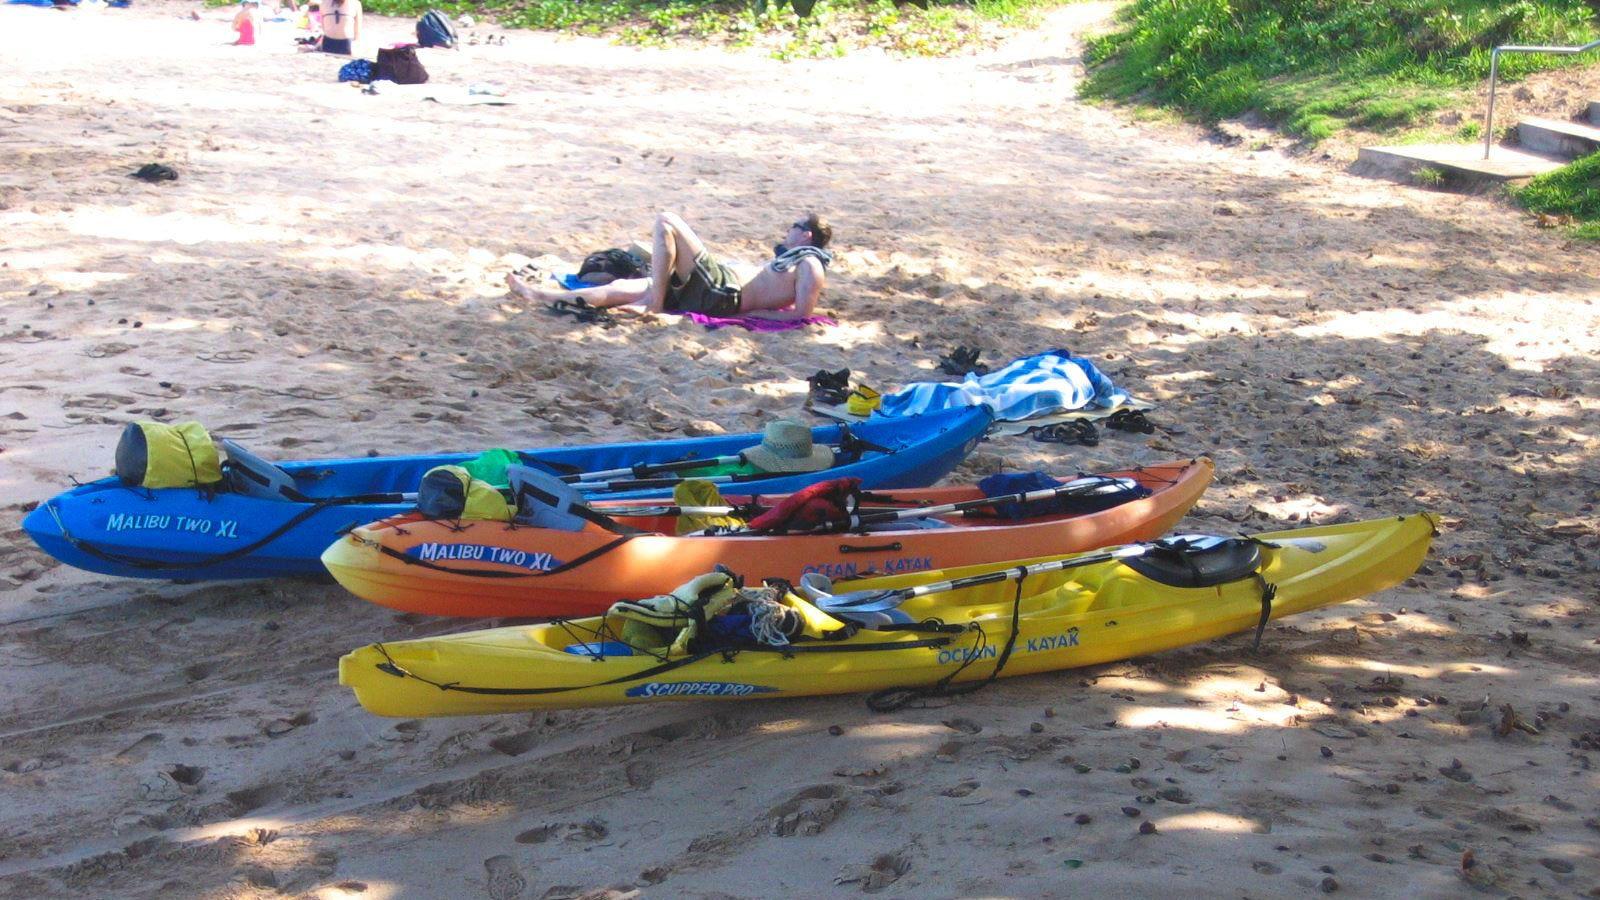 Kayak & Snorkel Adventure to Observe Green Sea Turtles